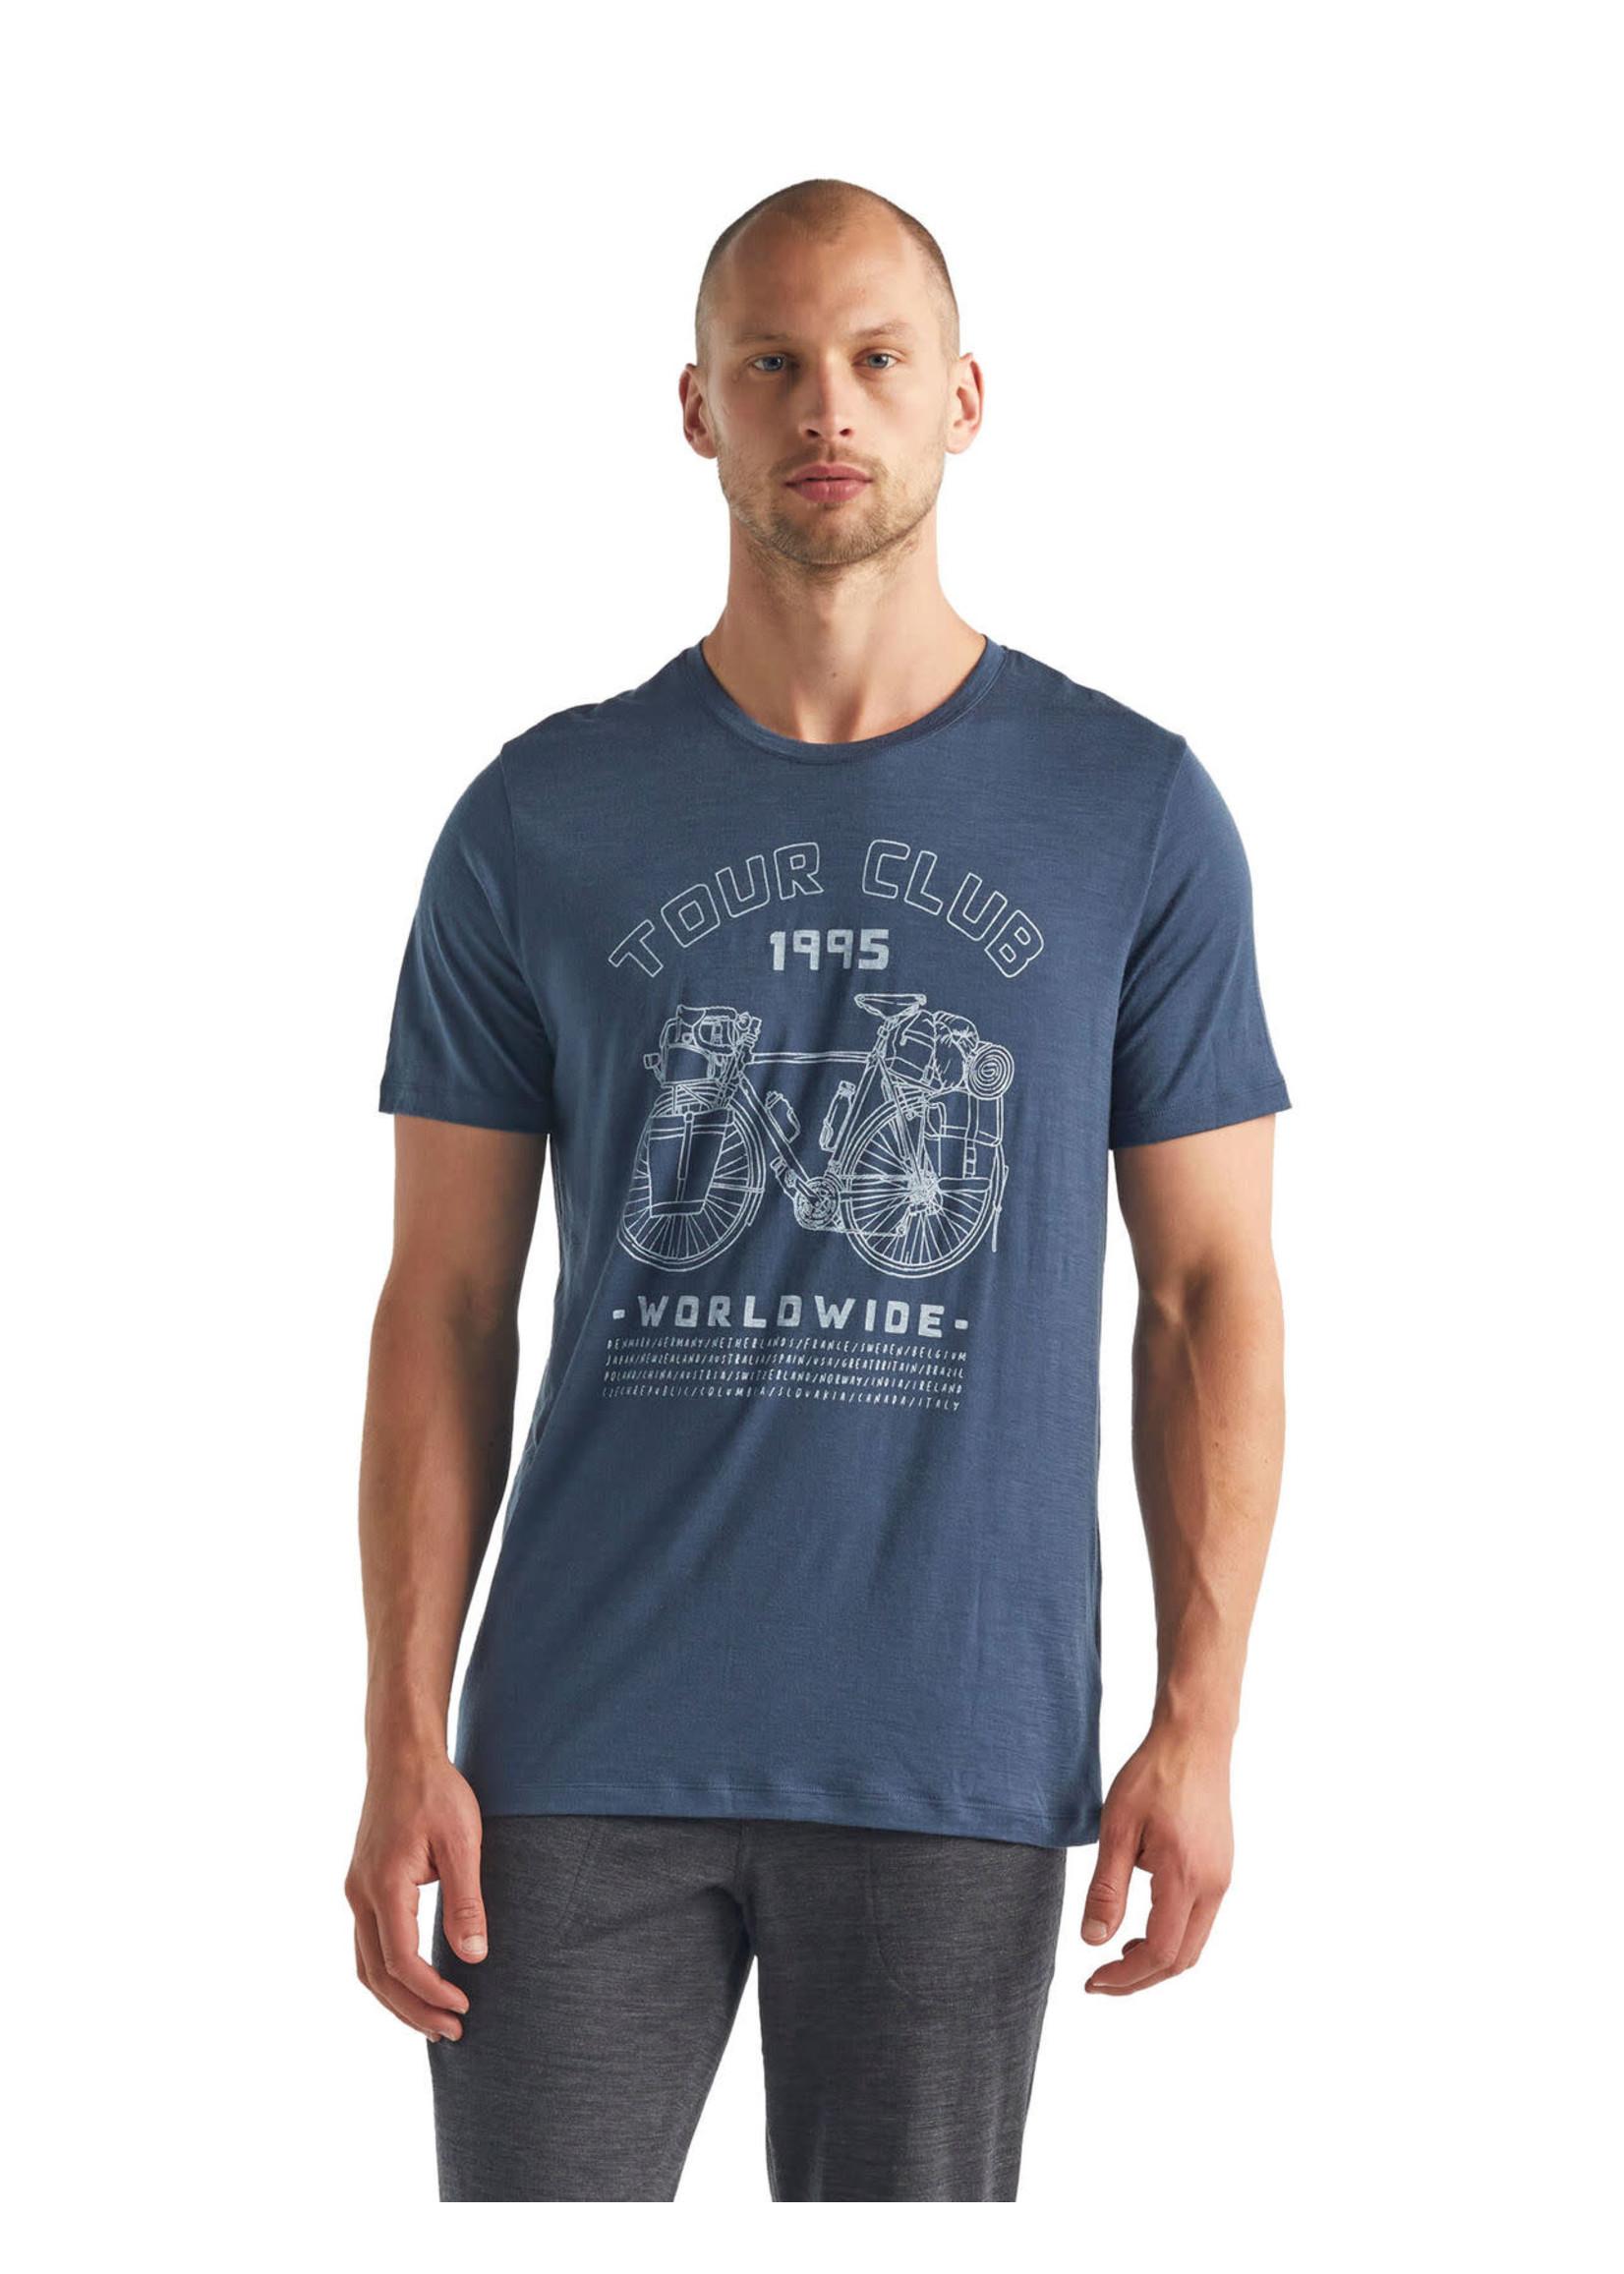 ICEBREAKER T-shirt à col rond Tech Lite Tour Club 1995